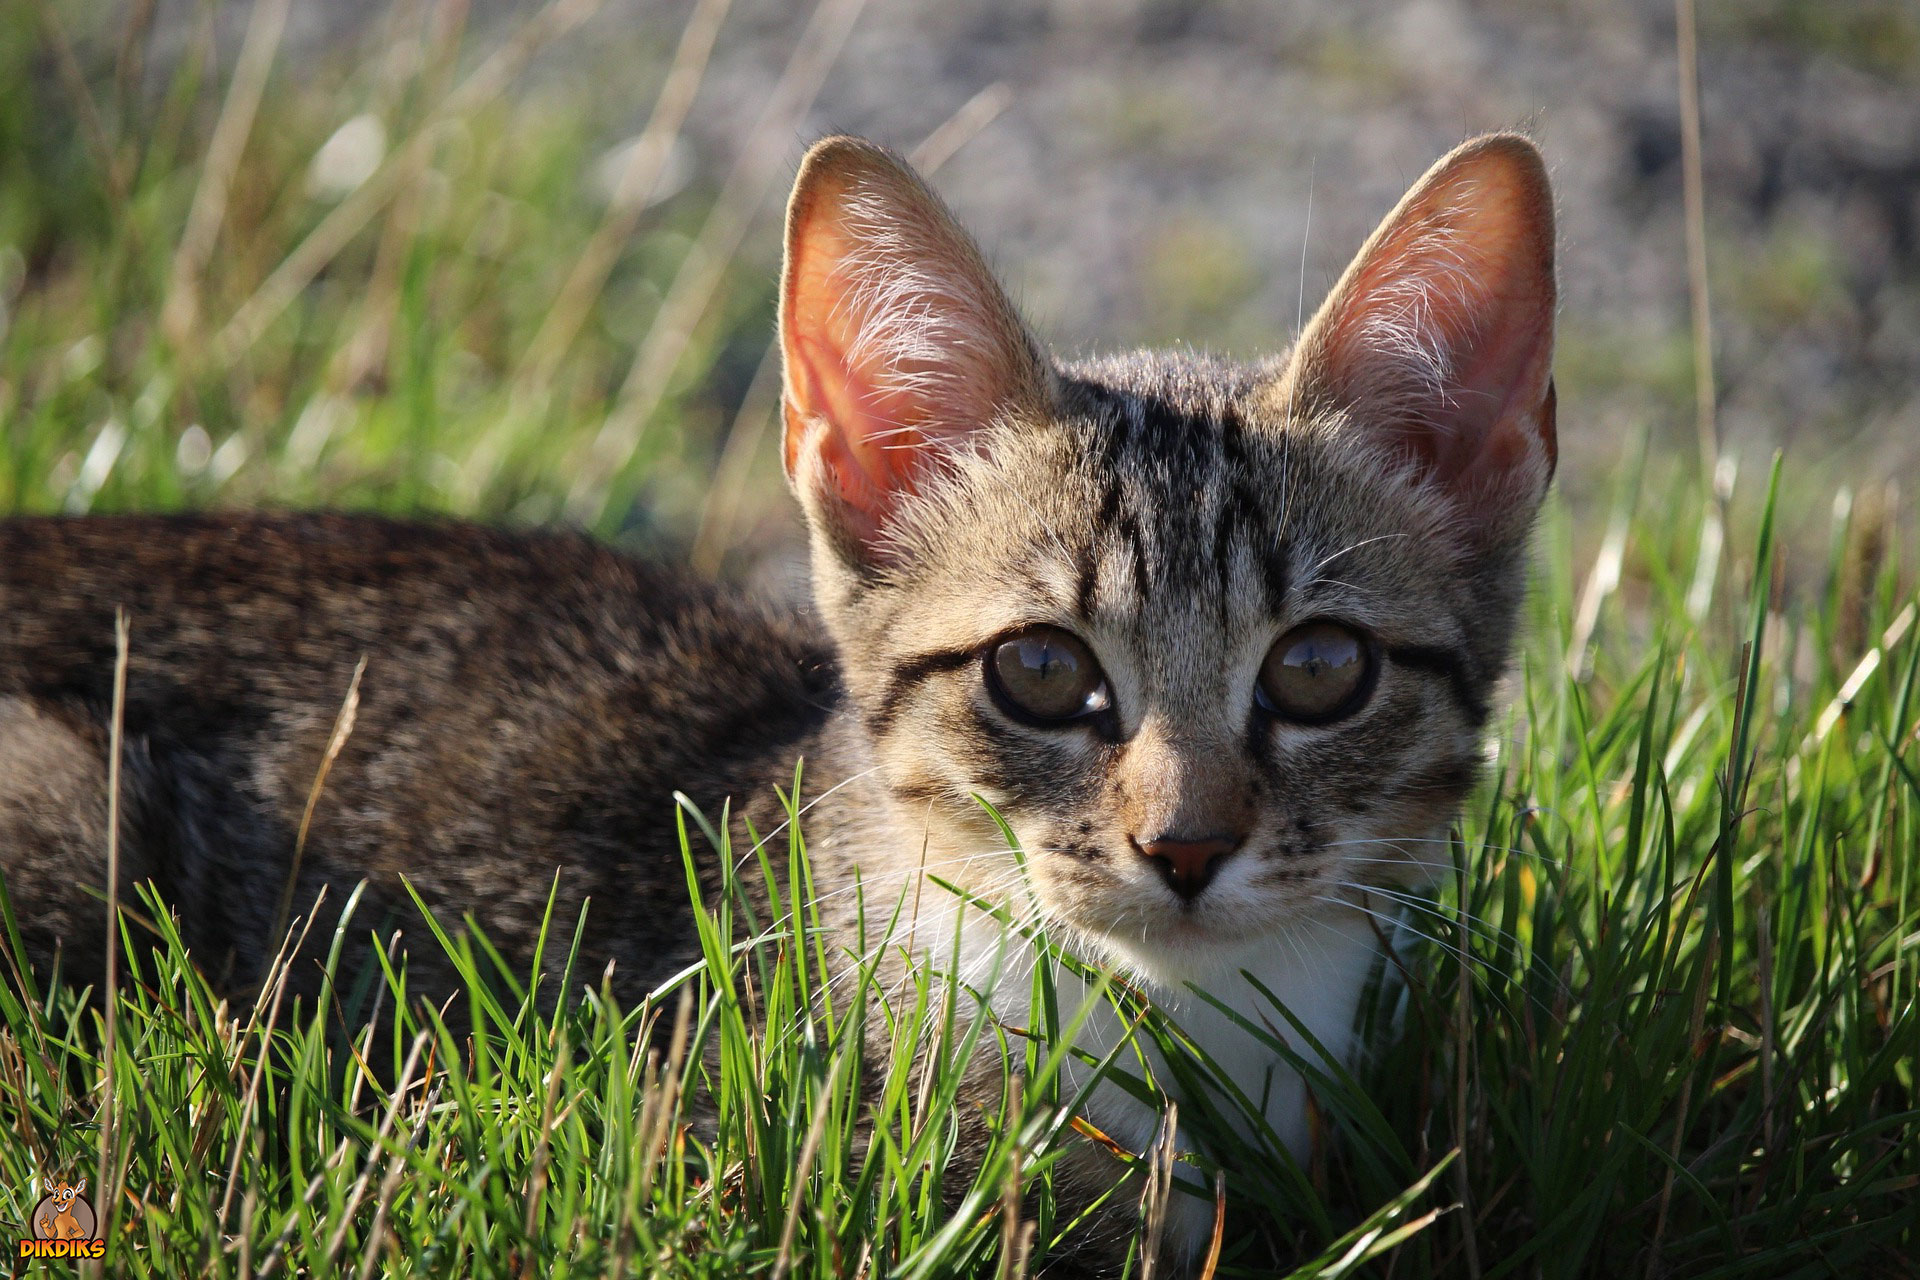 Kitten-Zahnwechsel